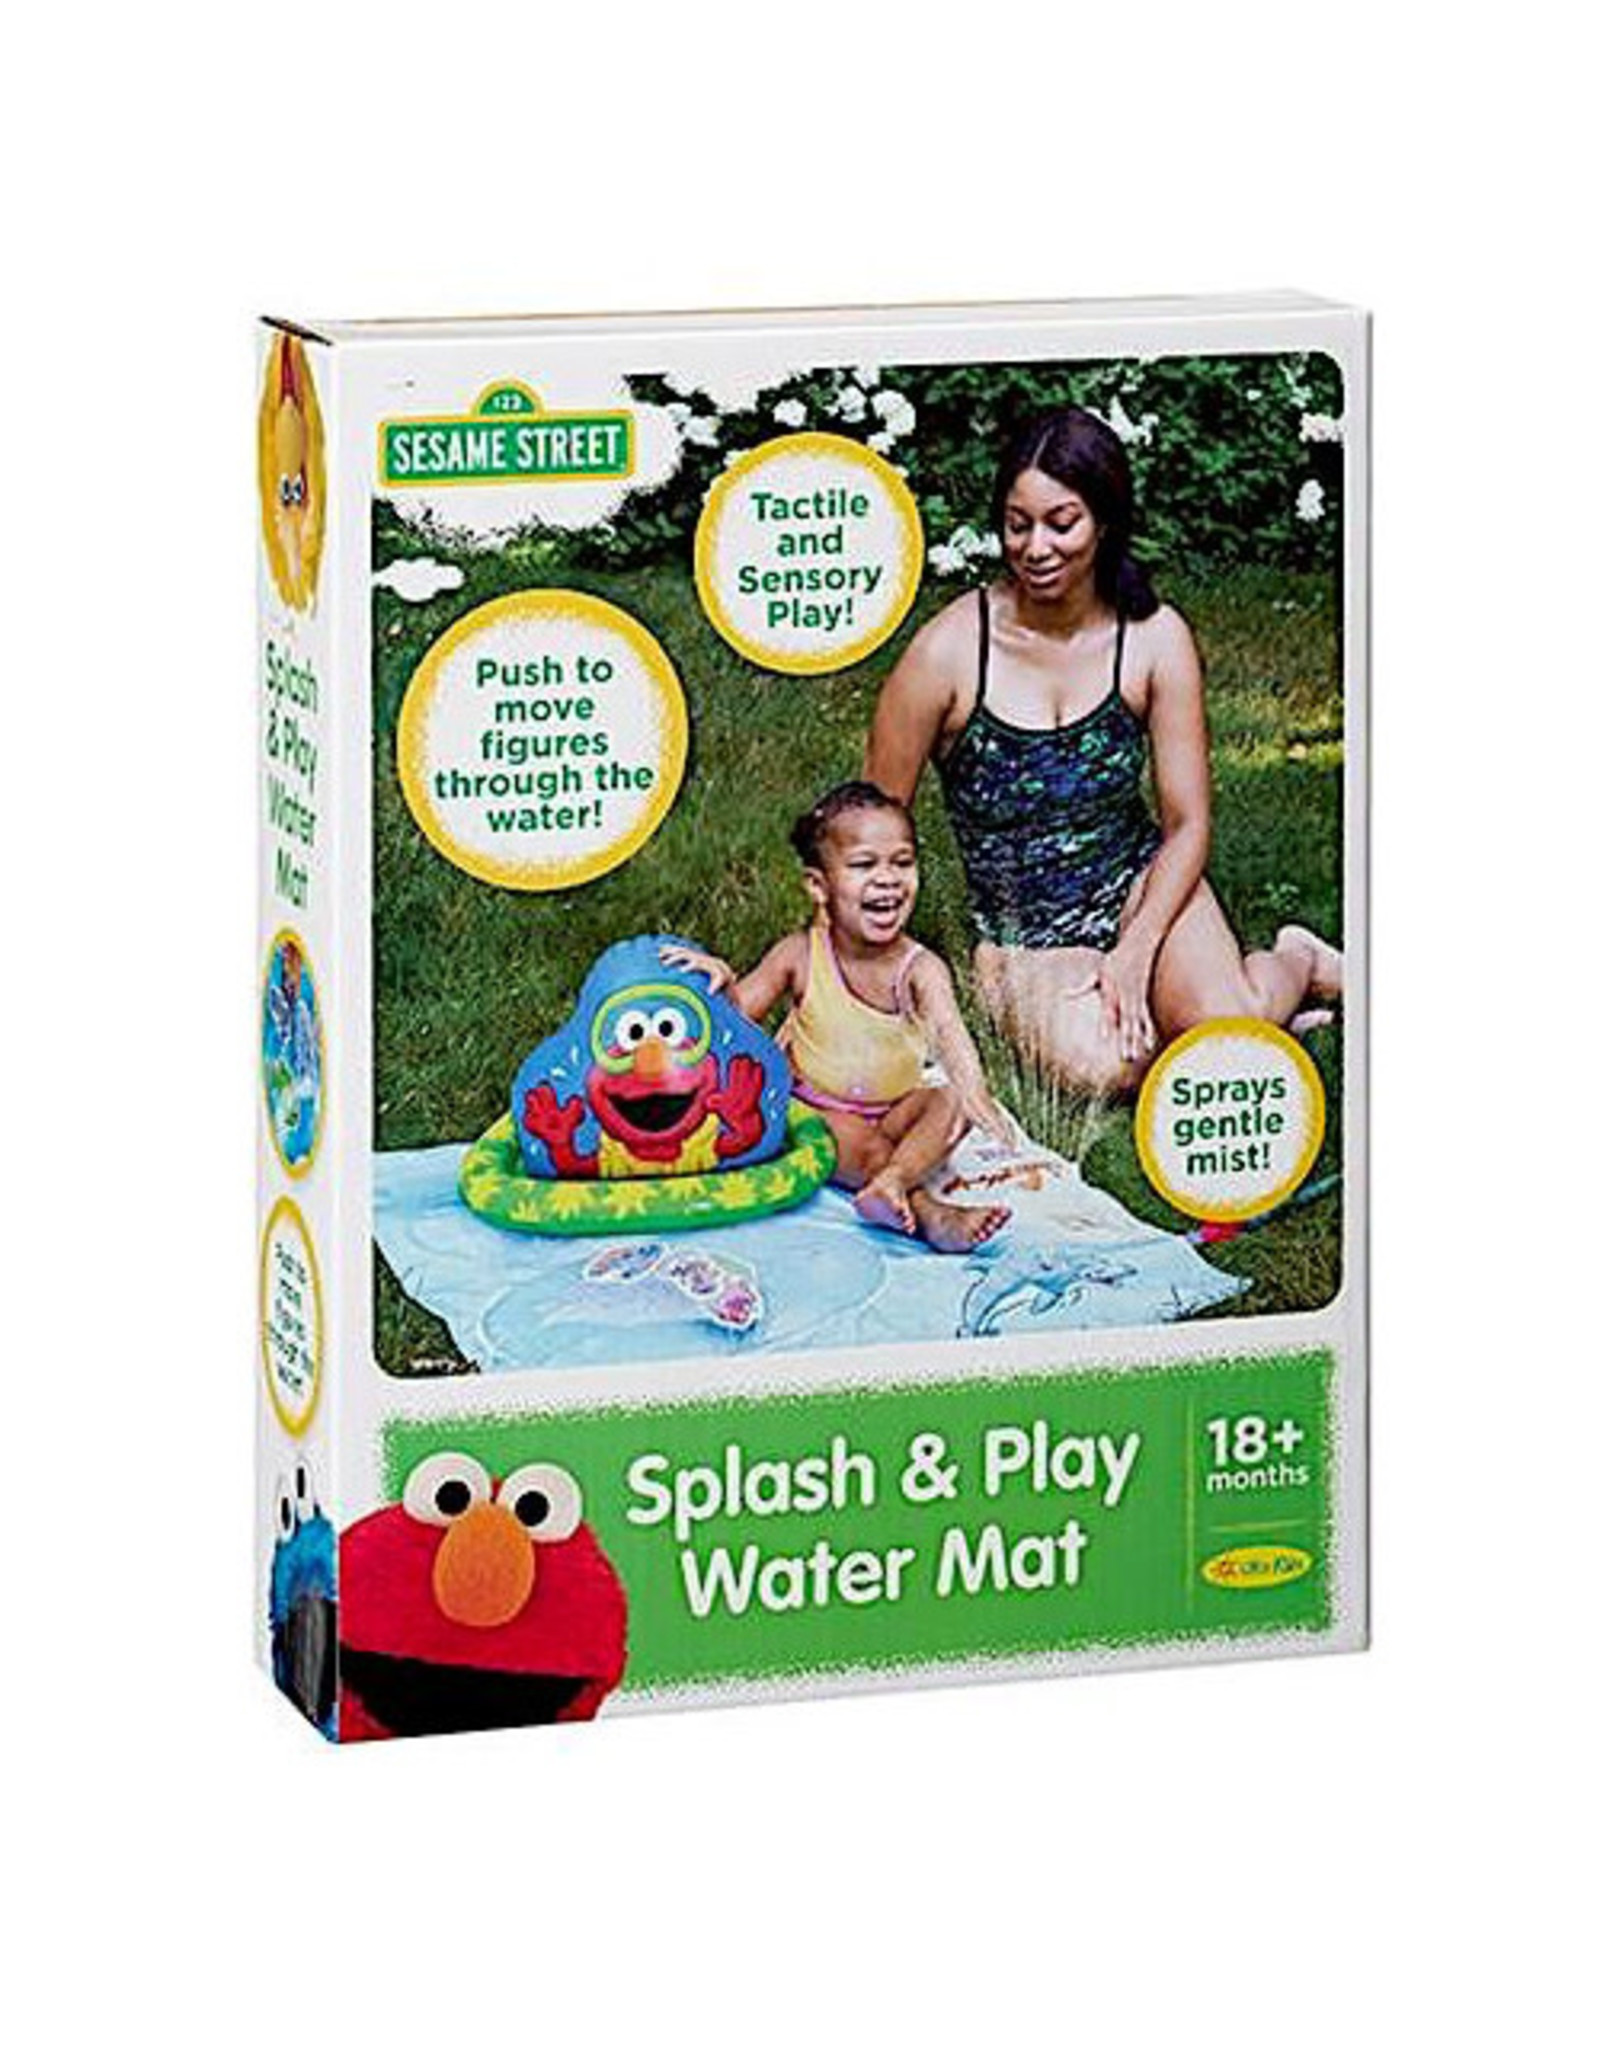 Little Kids Inc. Splash & Play Sesame Street